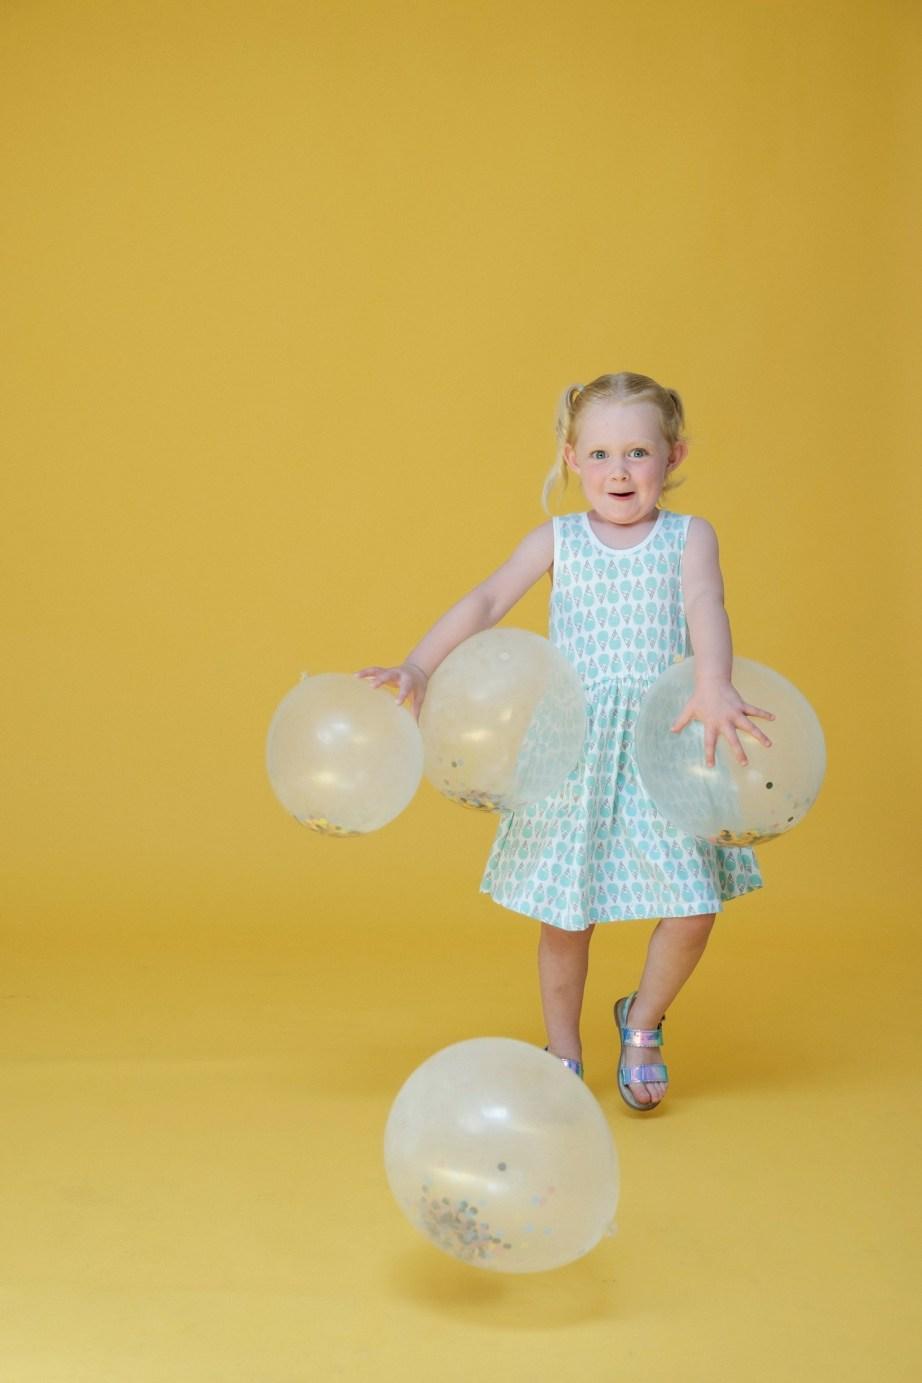 family photography studio orange county nicole caldwell 01